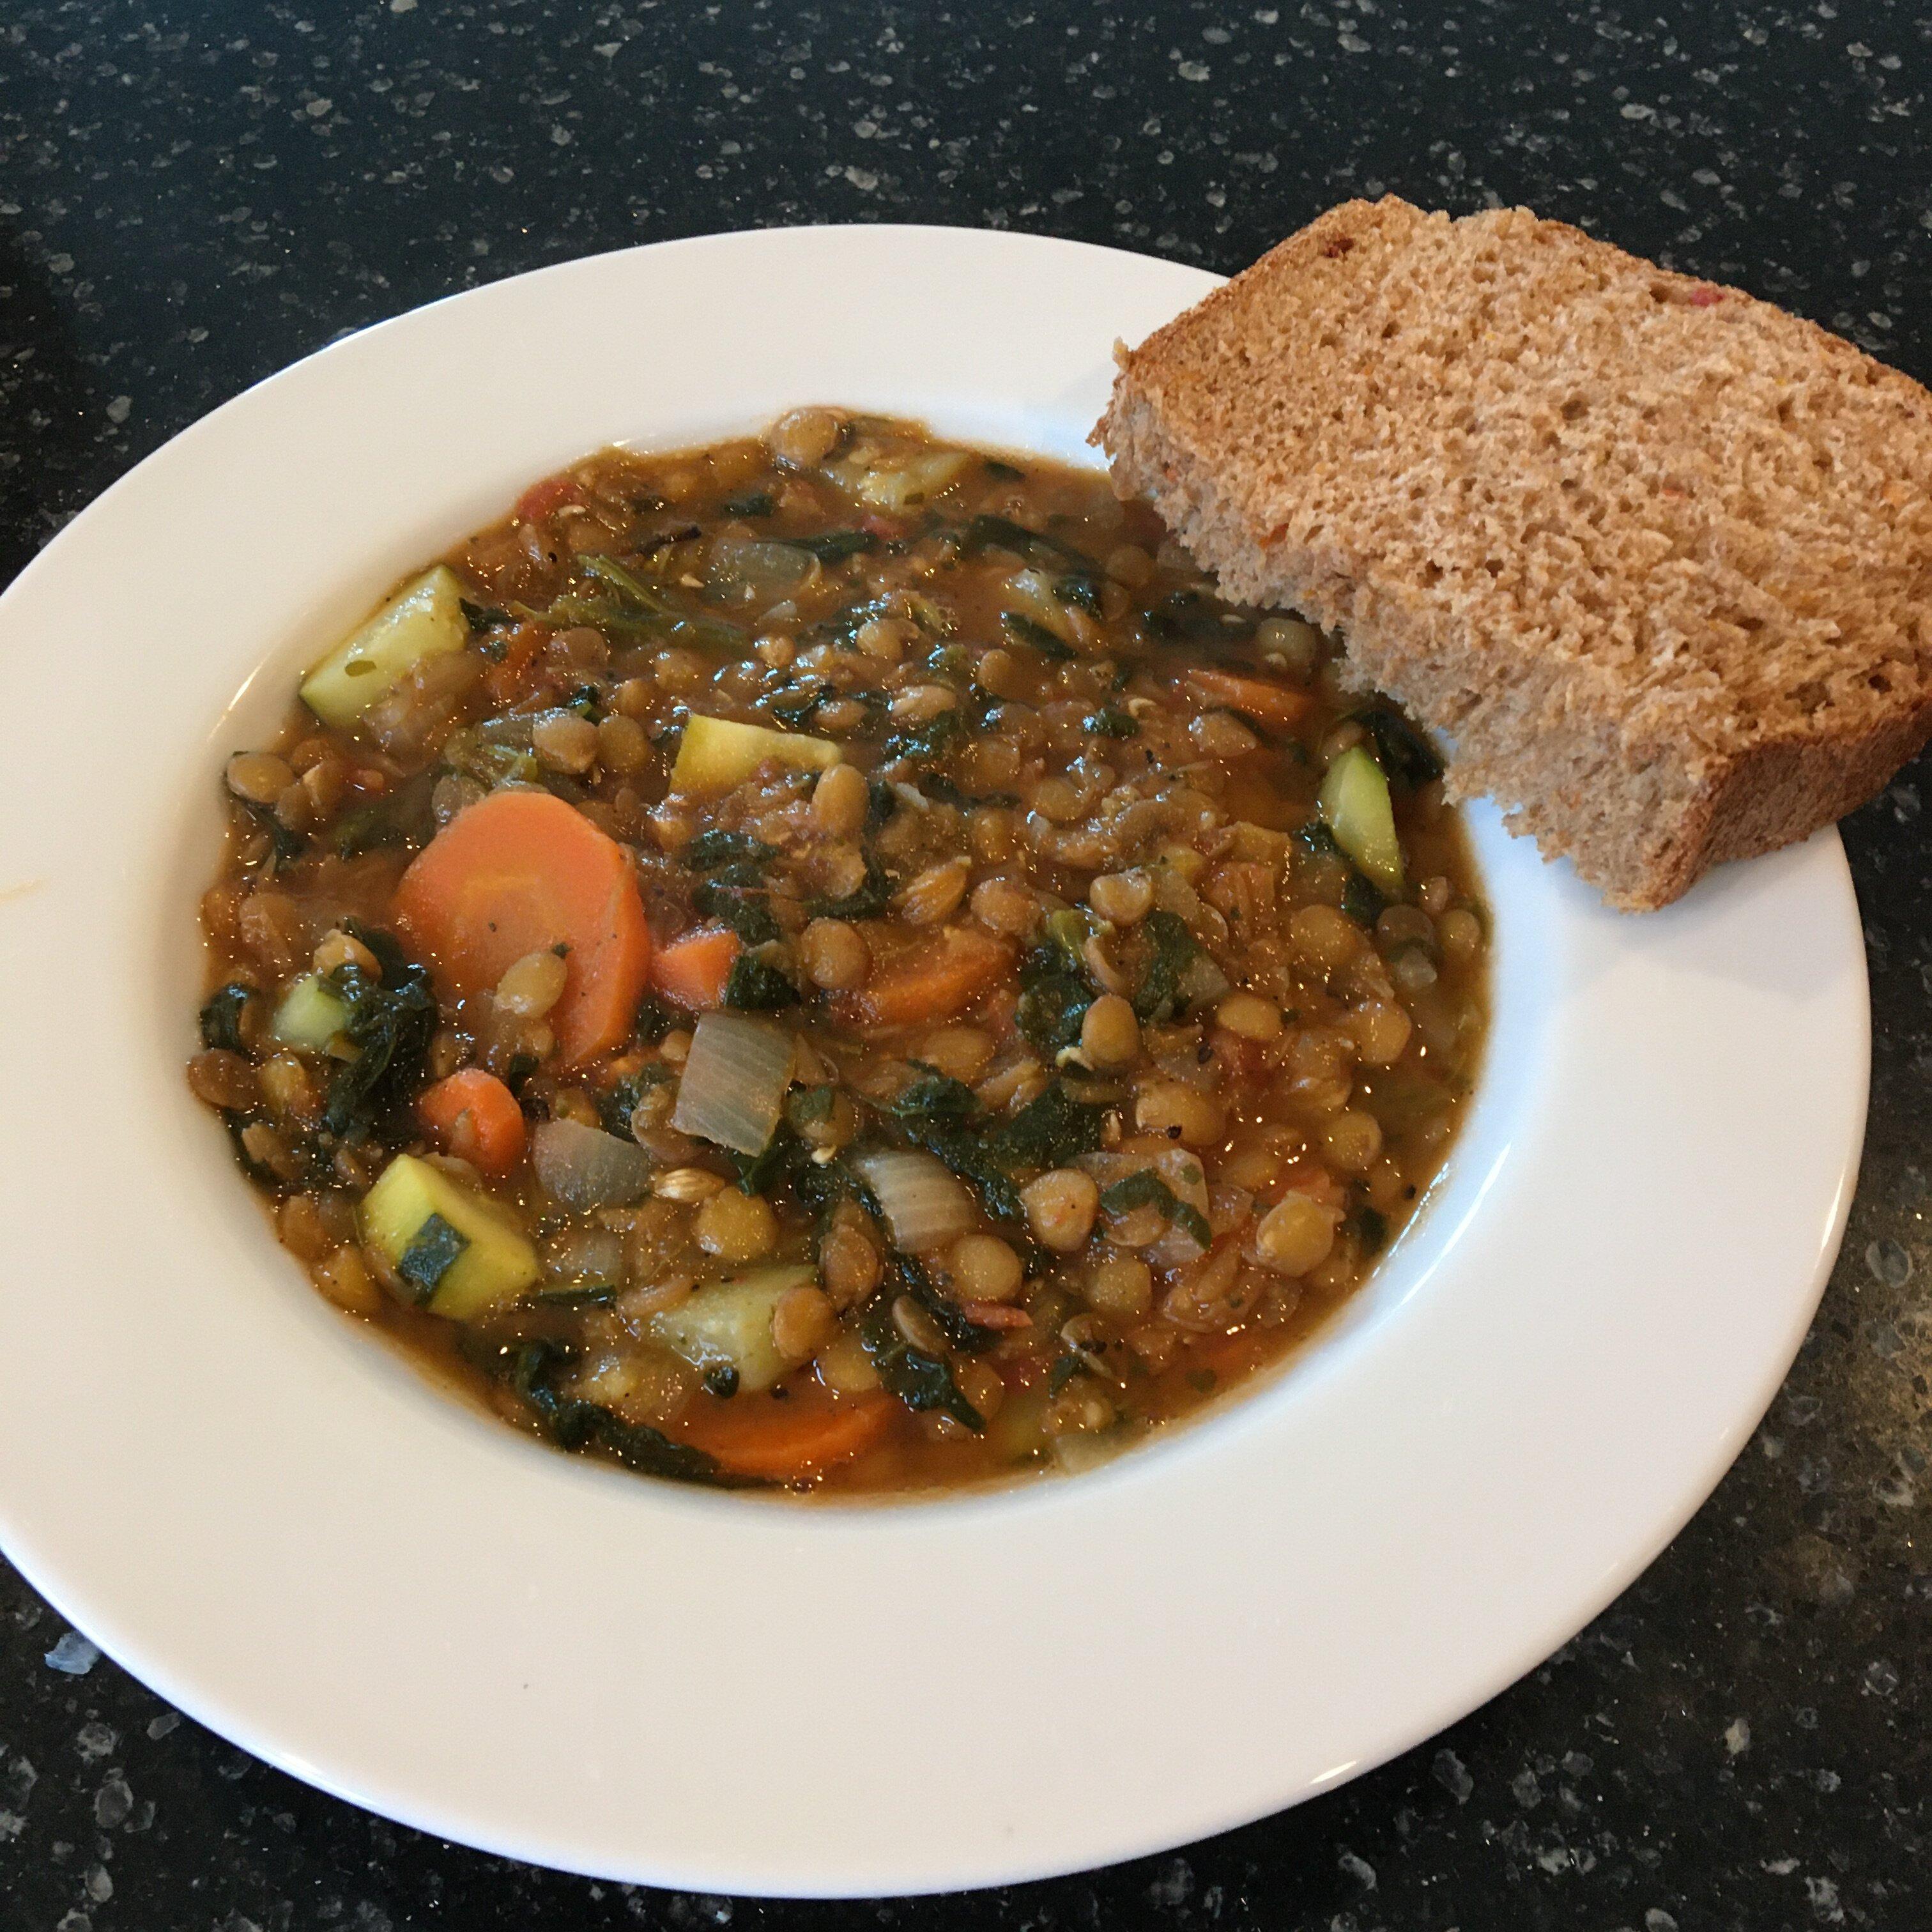 moroccan lentil soup with veggies recipe